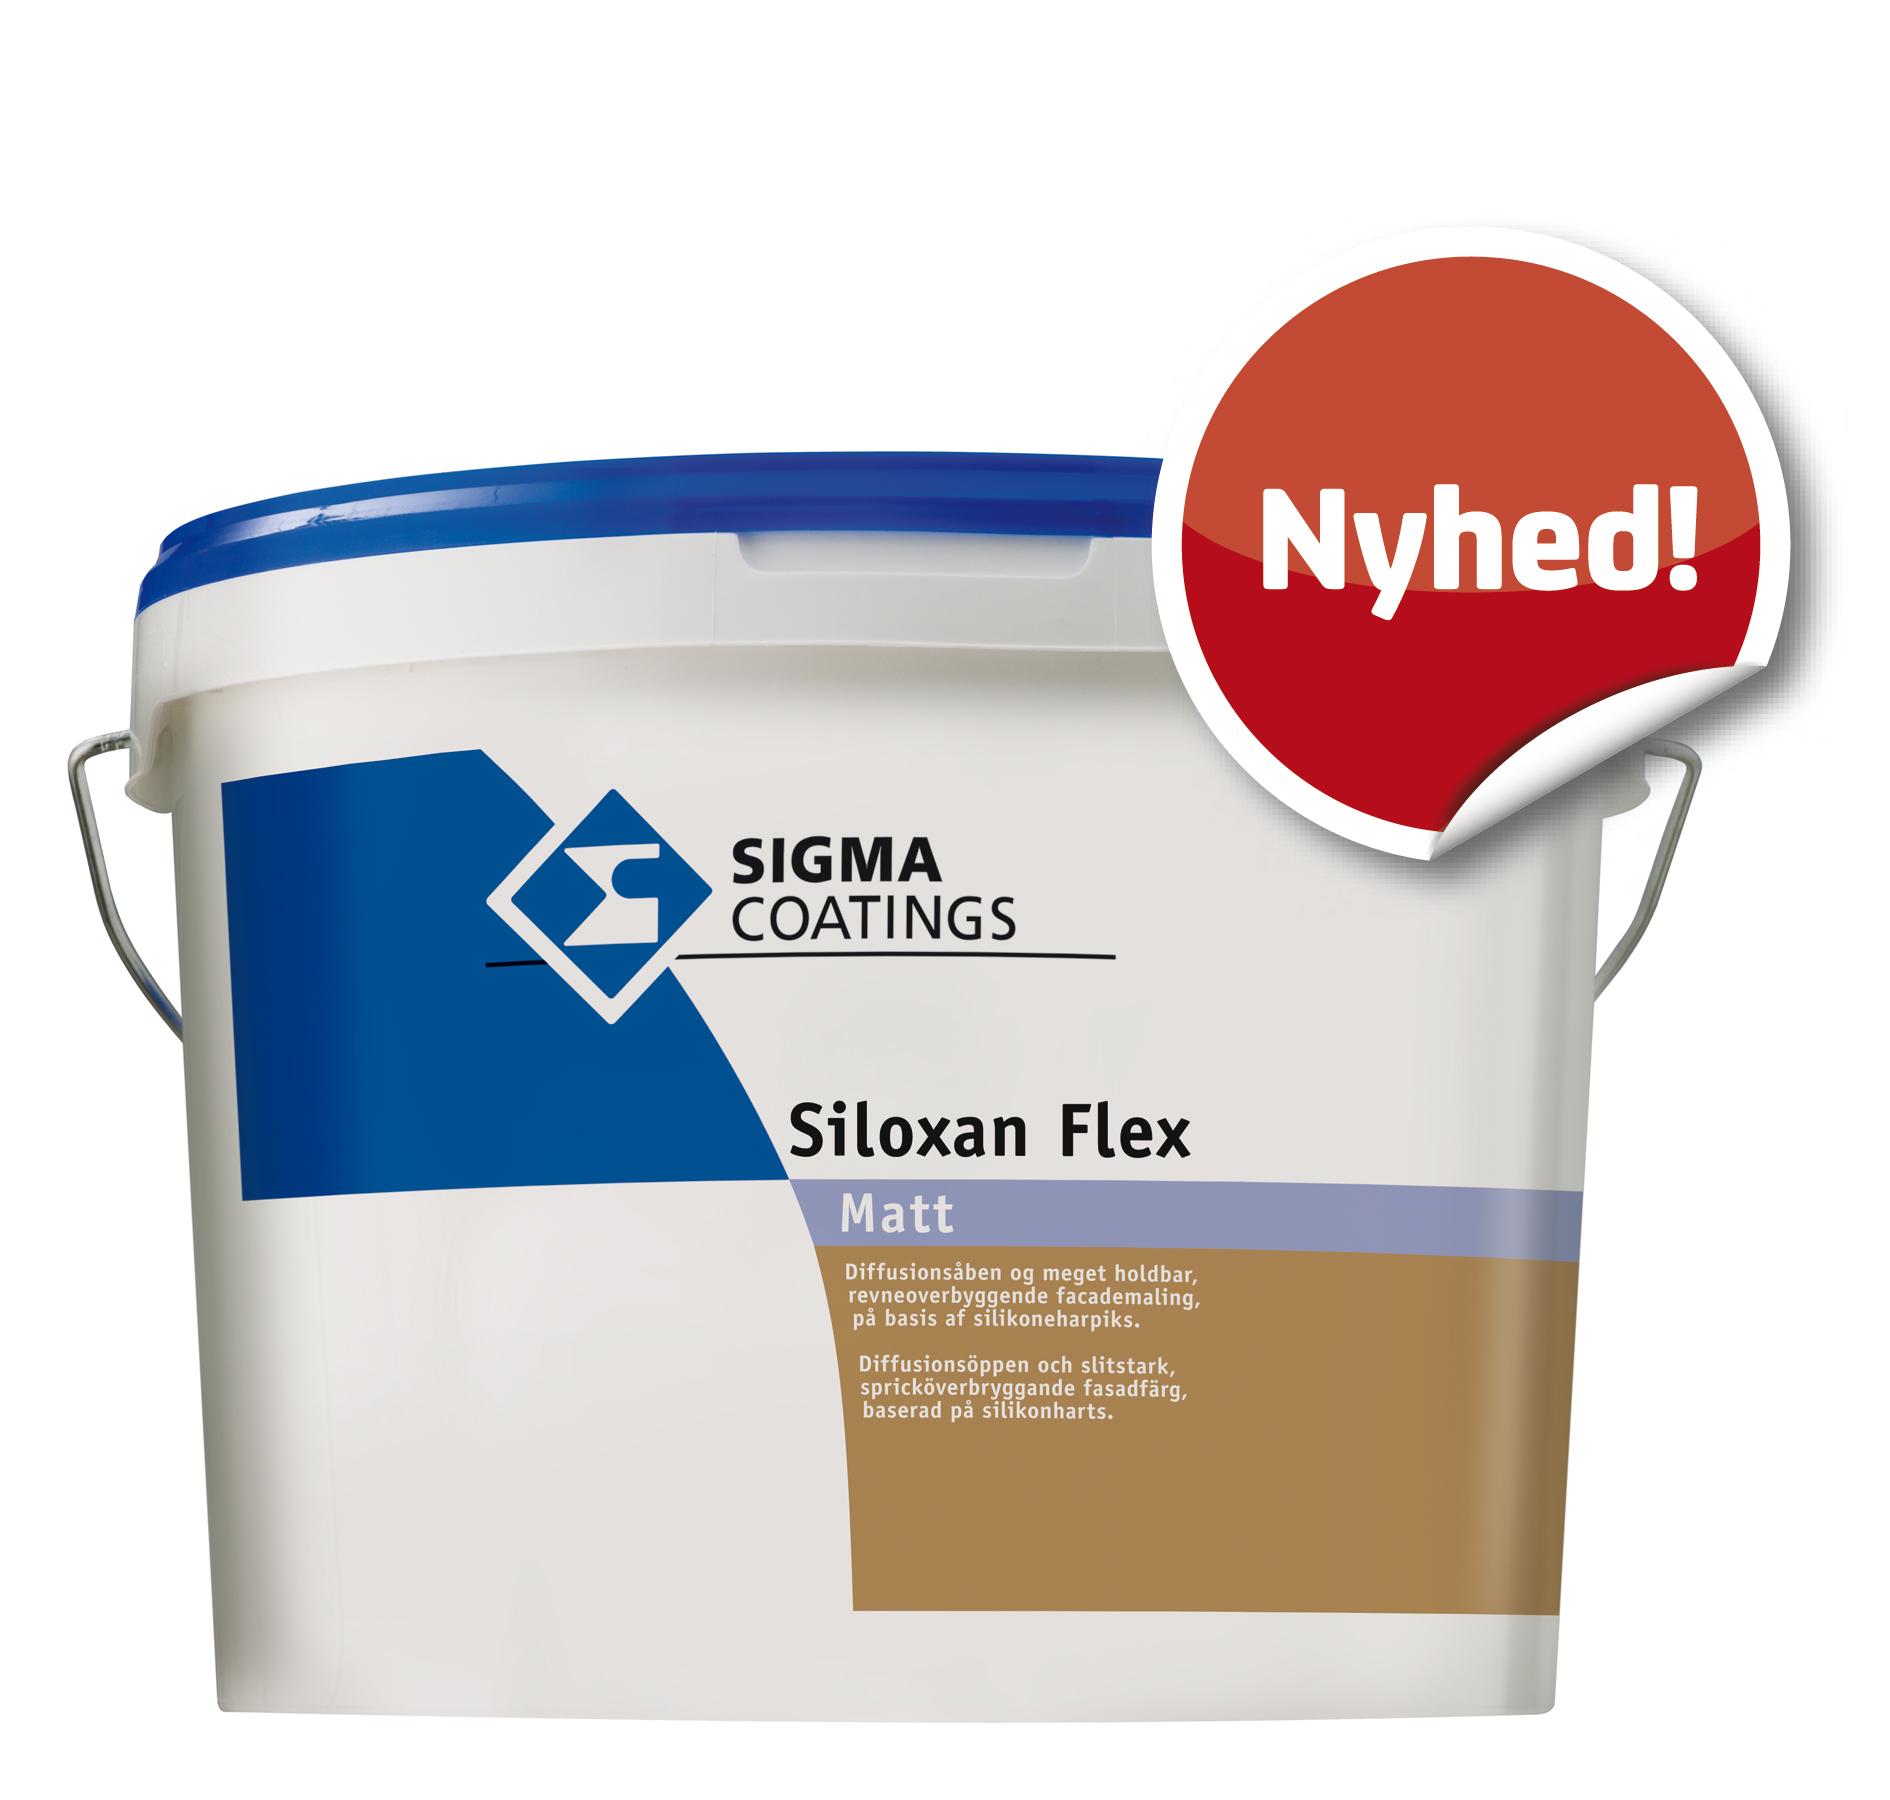 Siloxan Flex